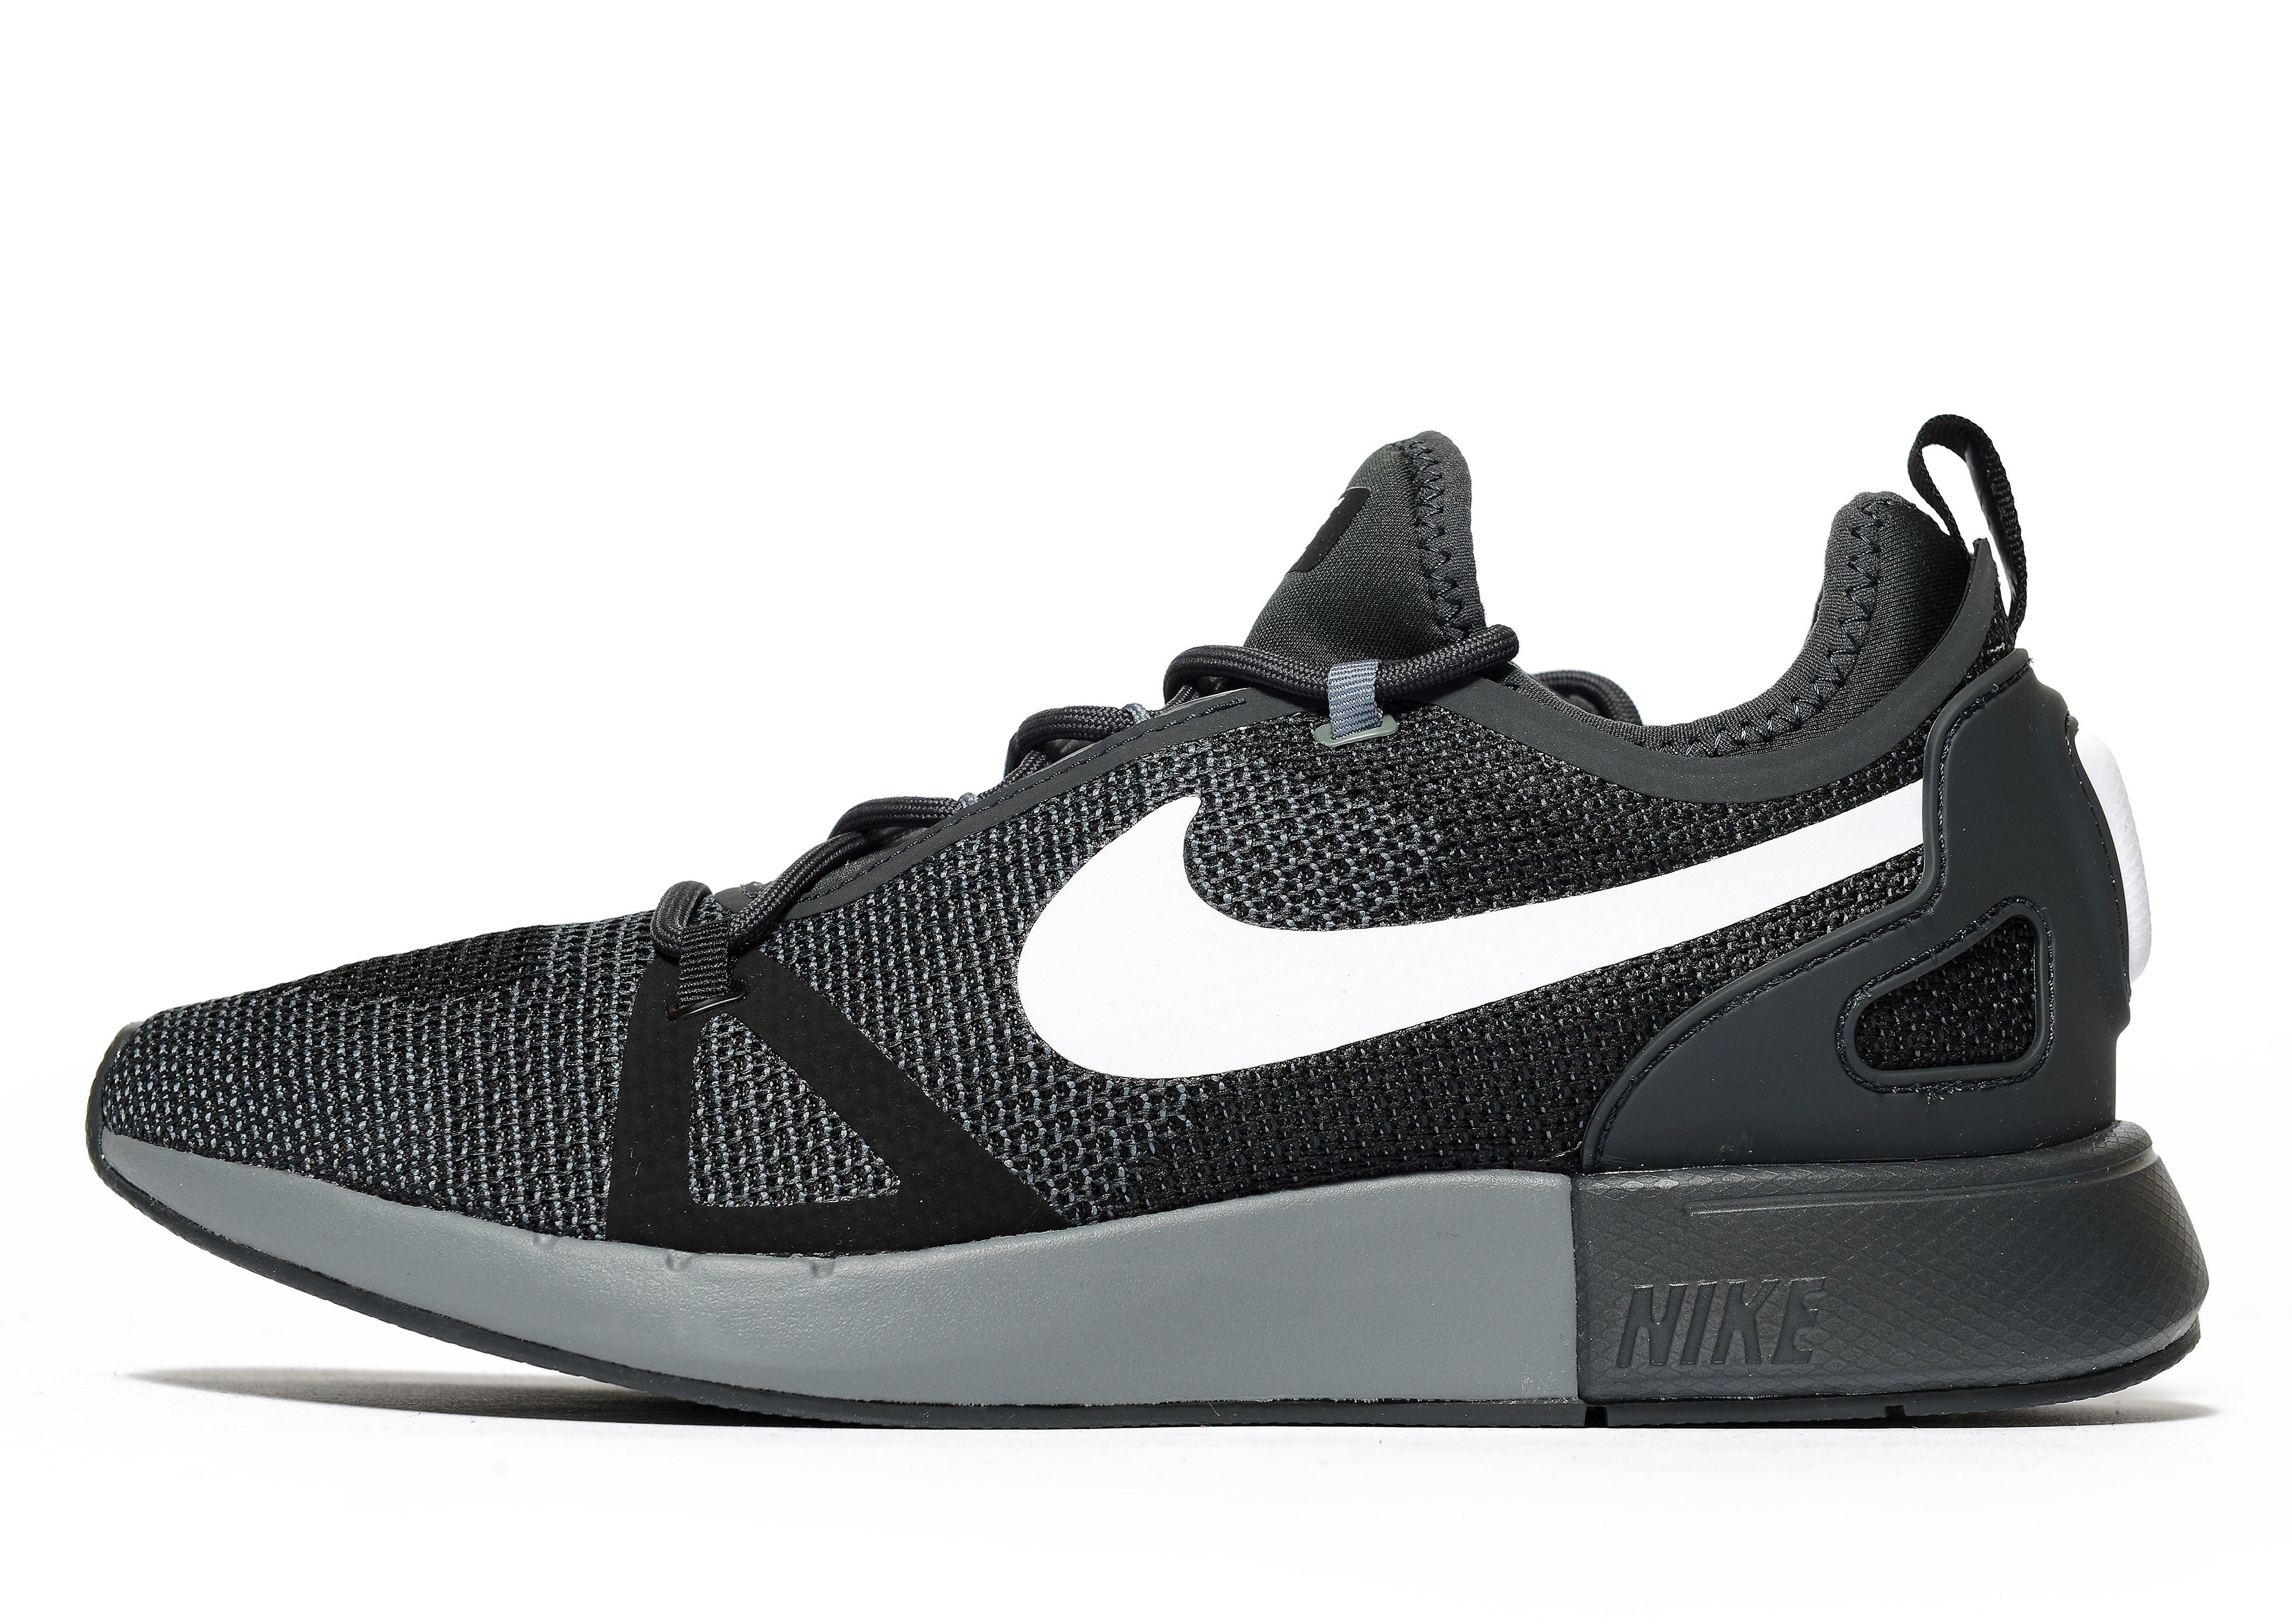 Nike Duelist Racer